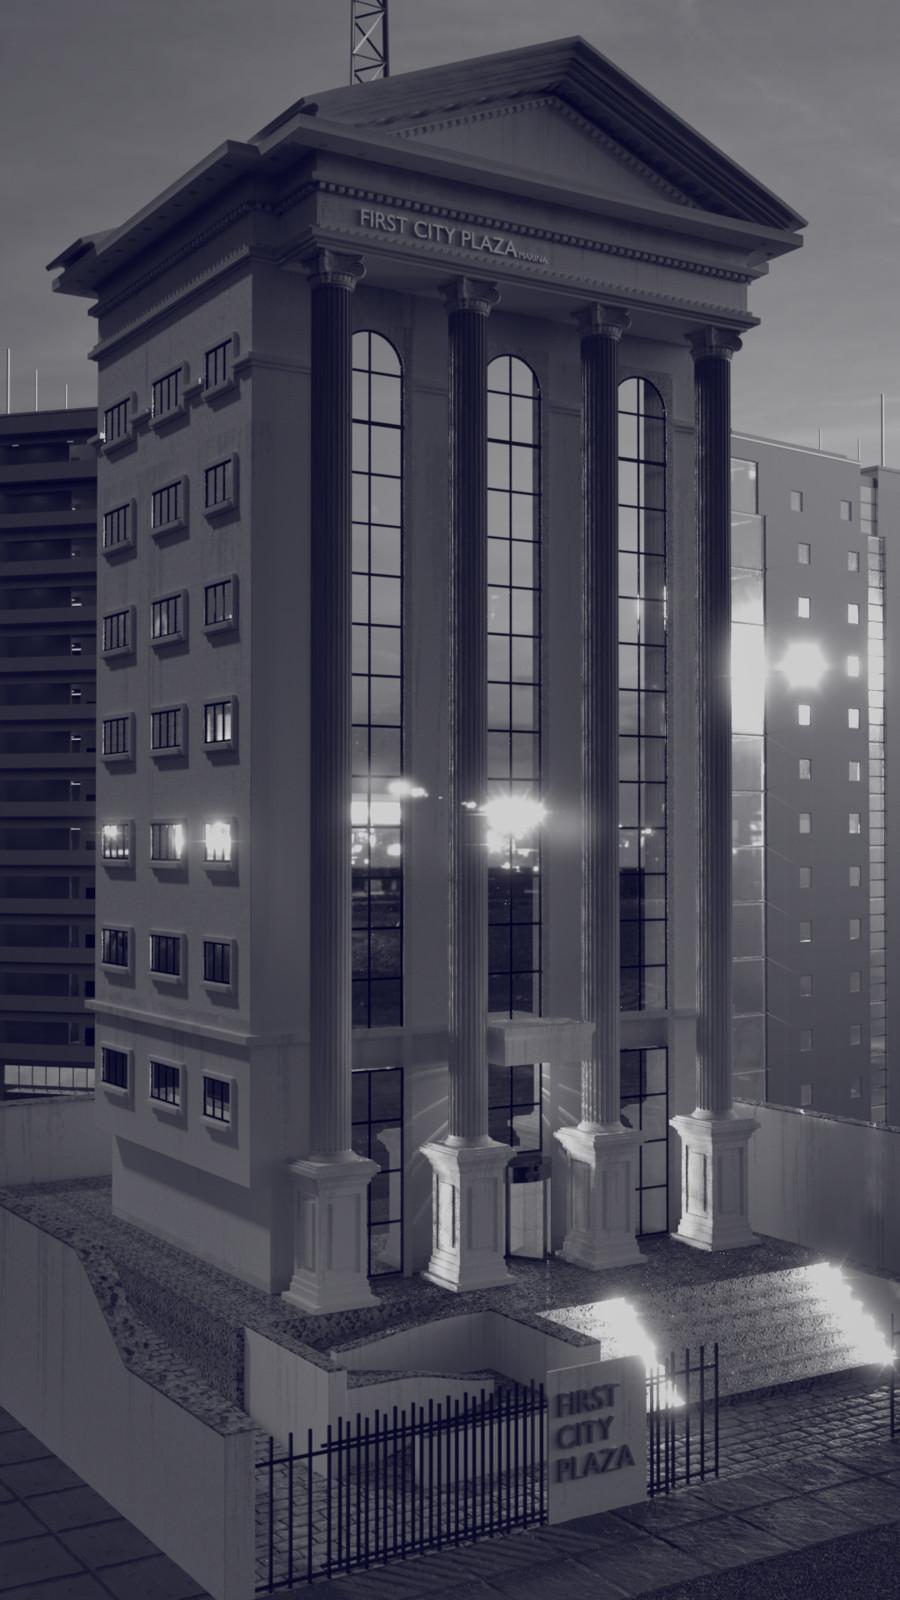 Grey scale version